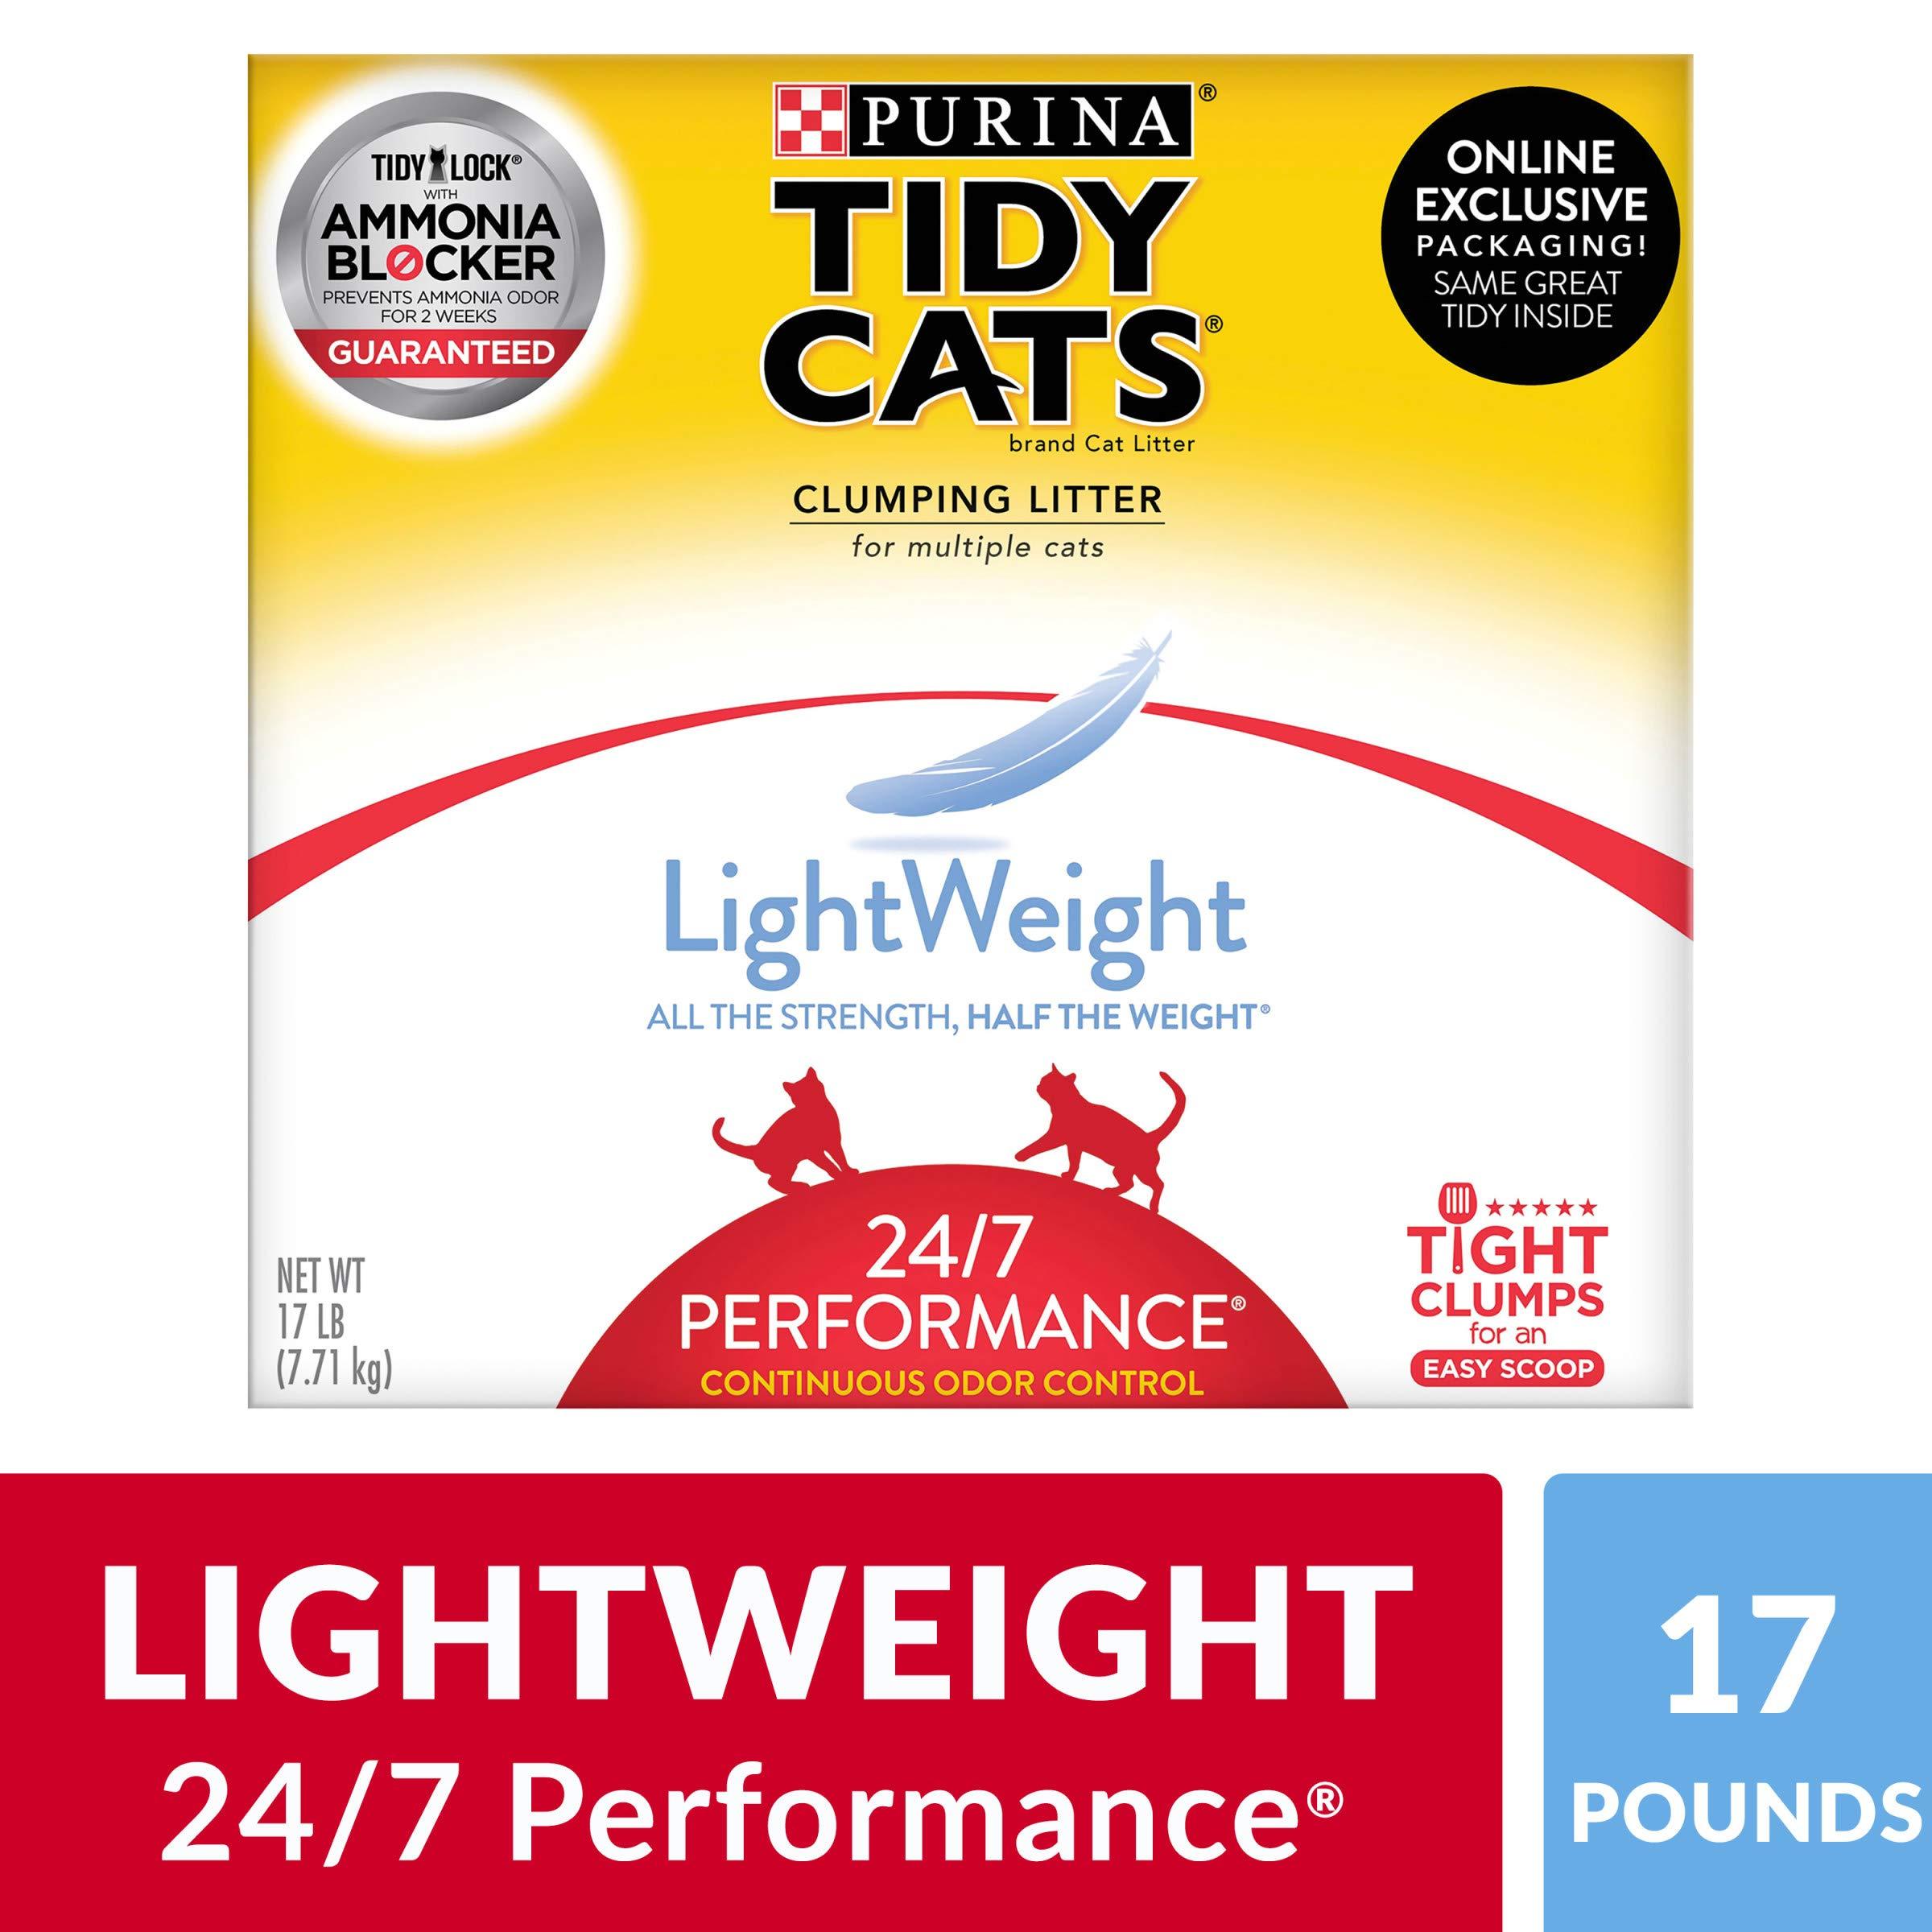 Purina Tidy Cats Light Weight, Low Dust, Clumping Cat Litter, LightWeight 24/7 Performance Multi Cat Litter - 17 lb. Box by Purina Tidy Cats